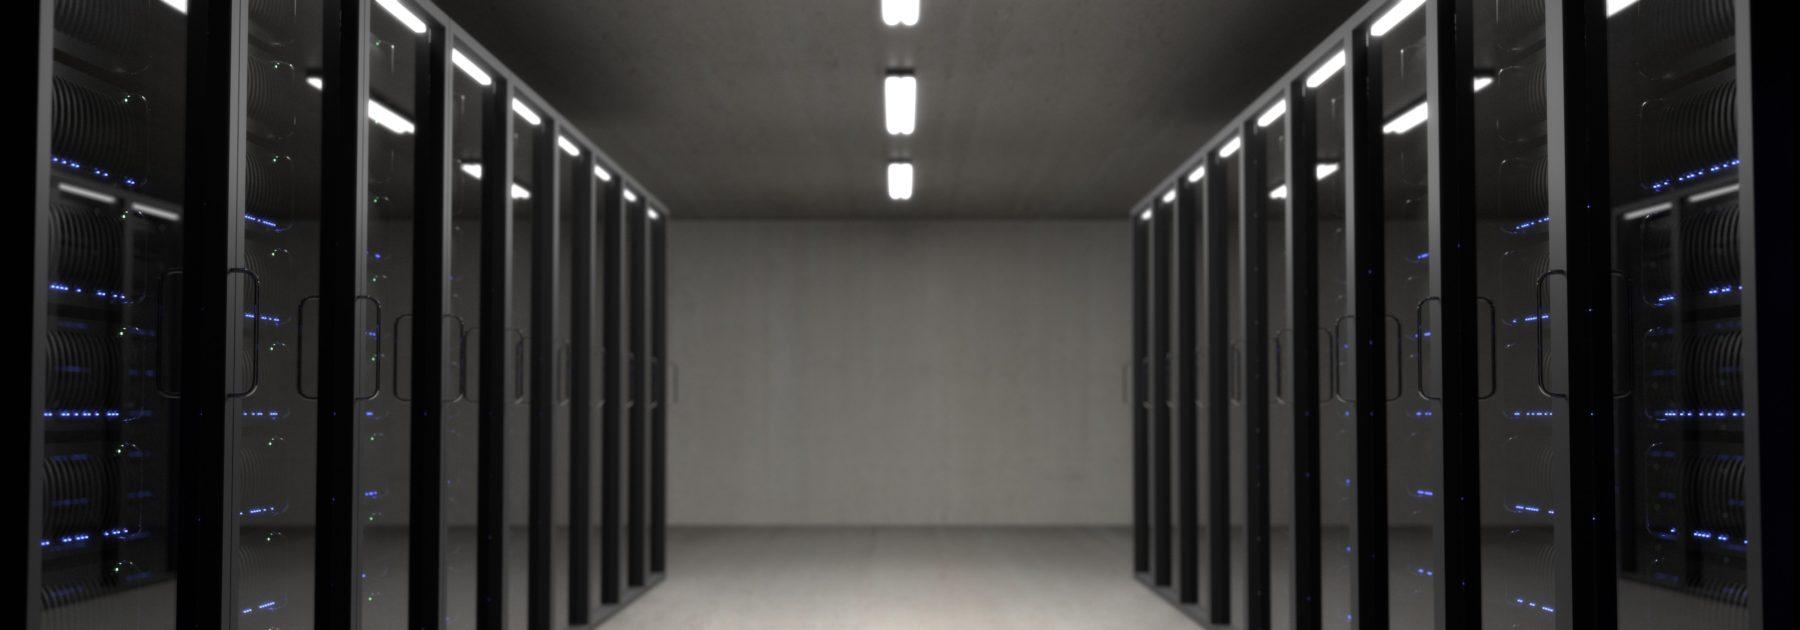 Photo of inside a data centre